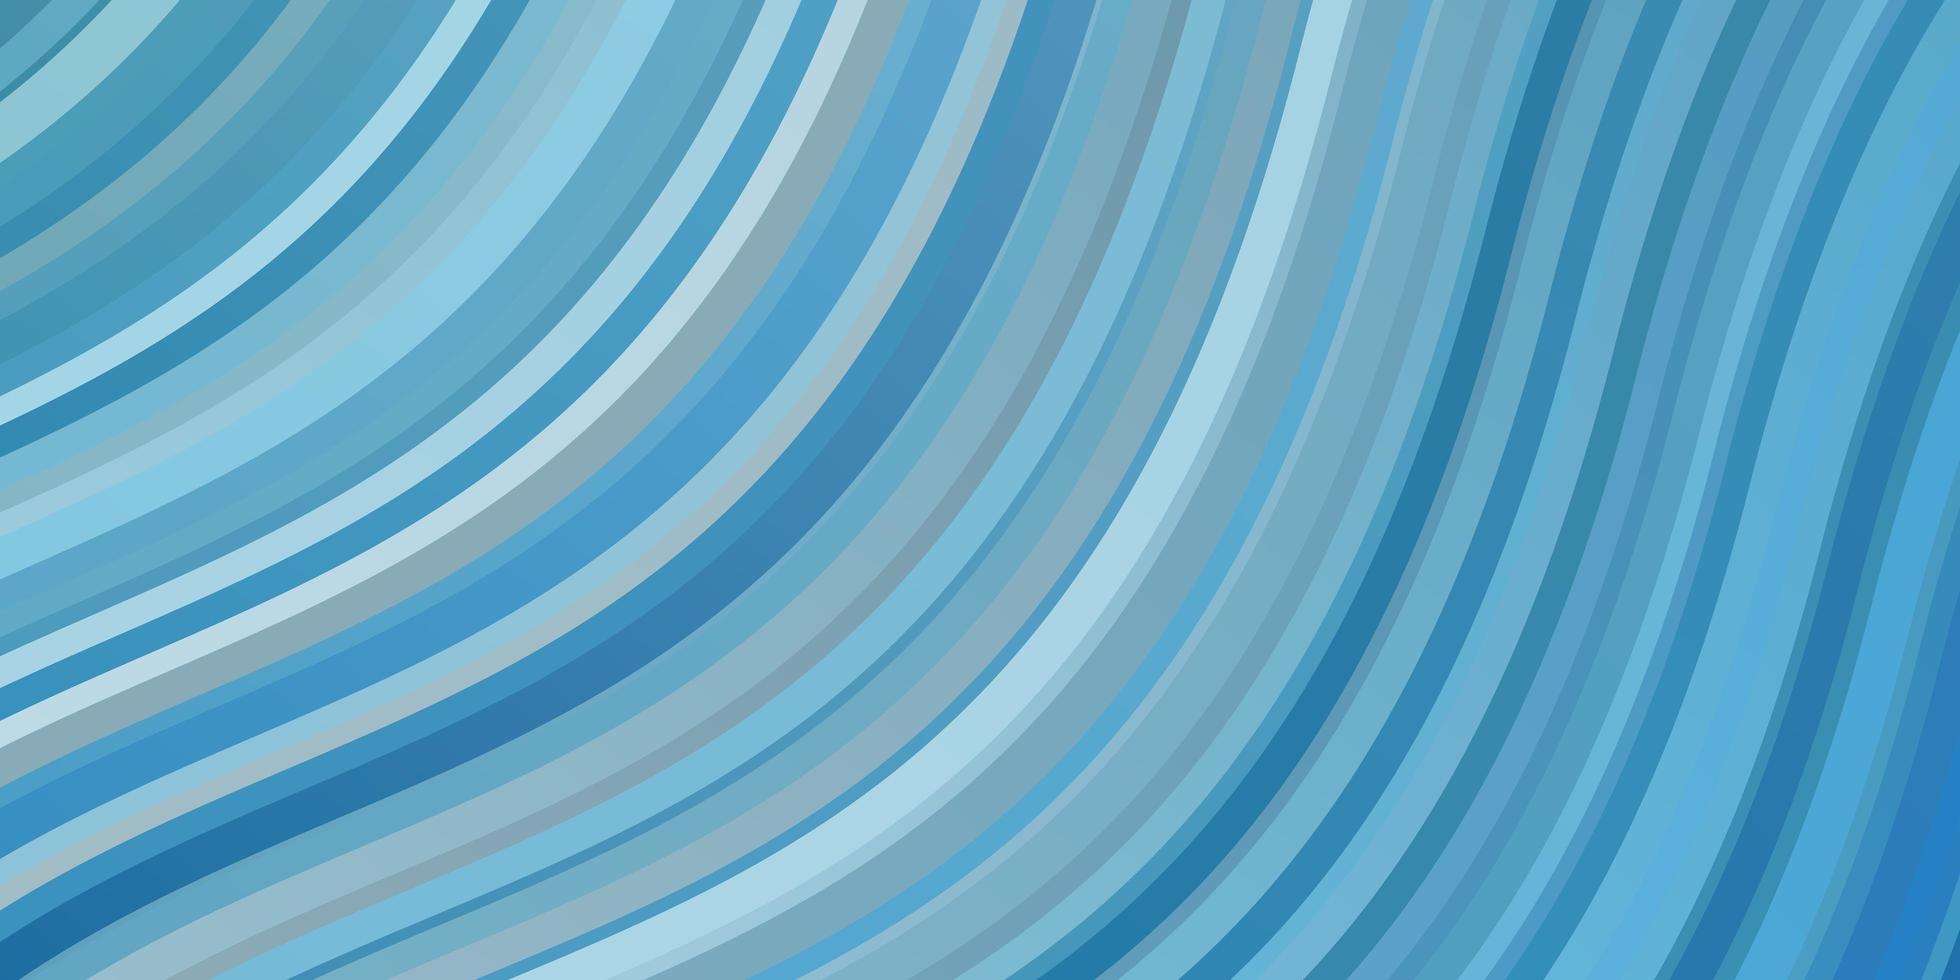 hellblaue Textur mit Kurven. vektor